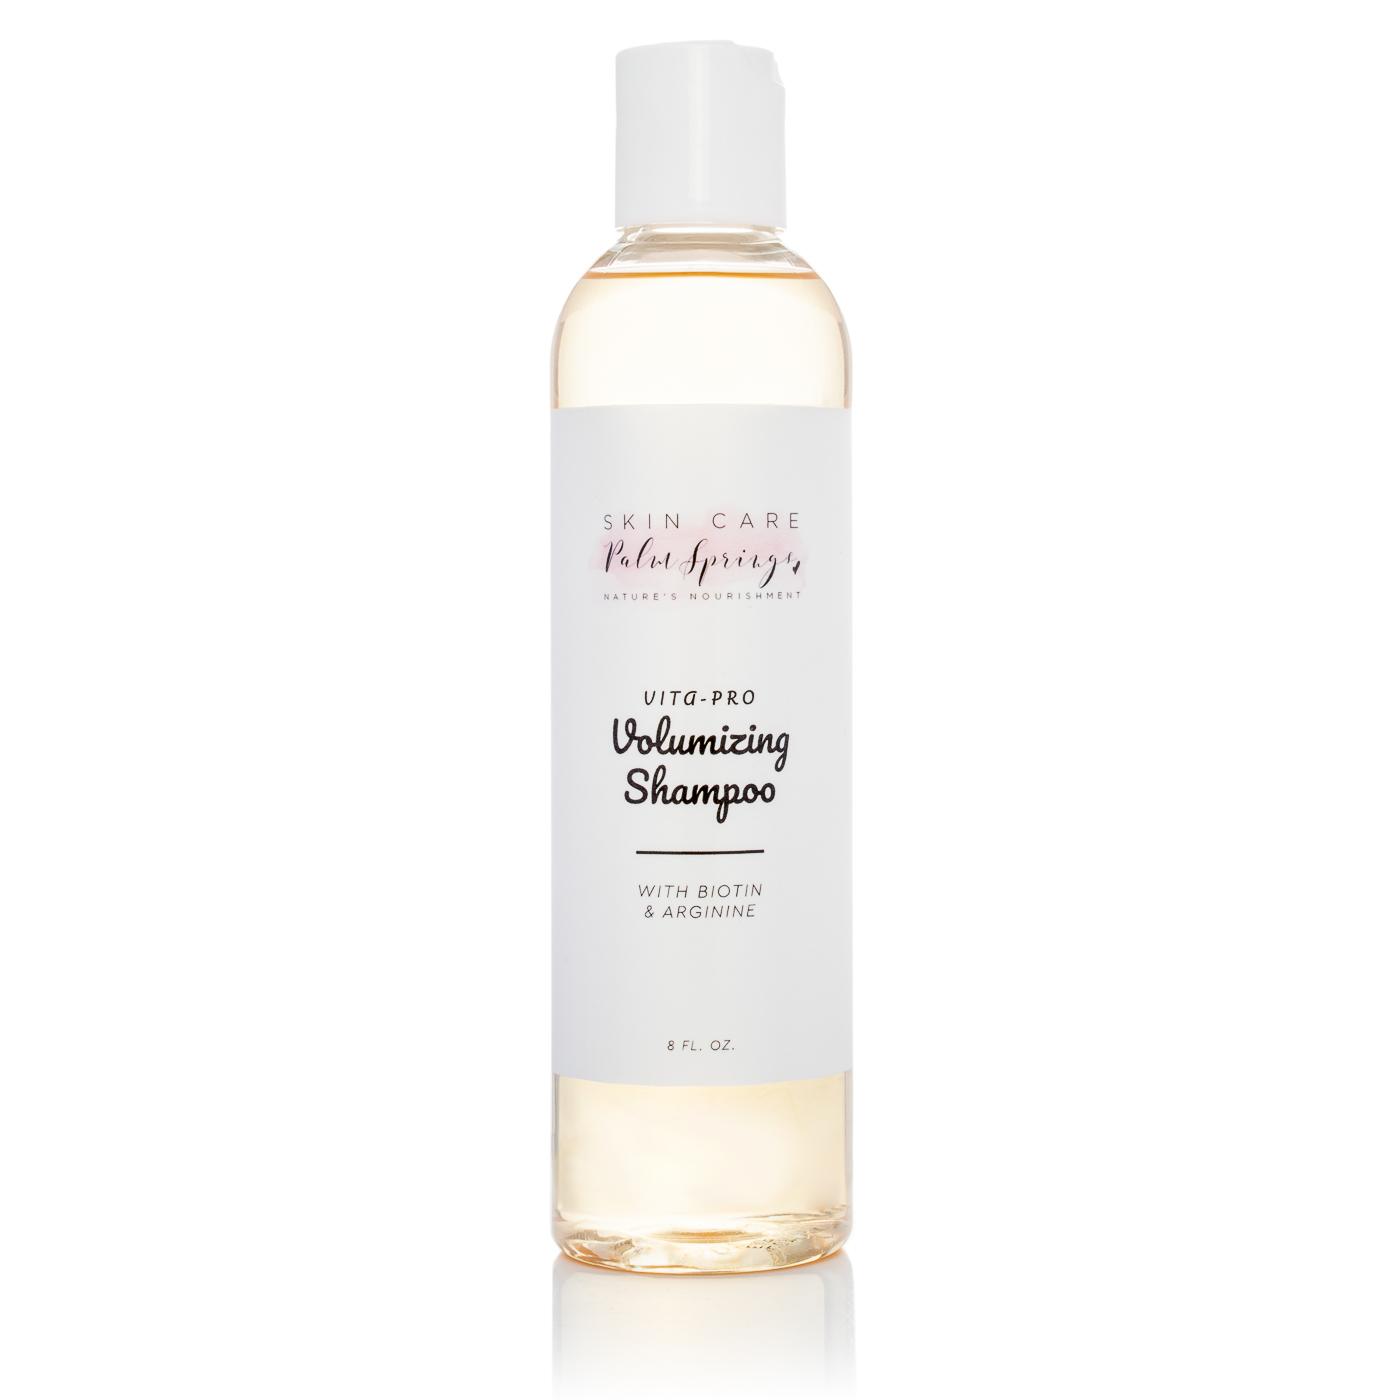 VITA-PRO Volumizing Shampoo